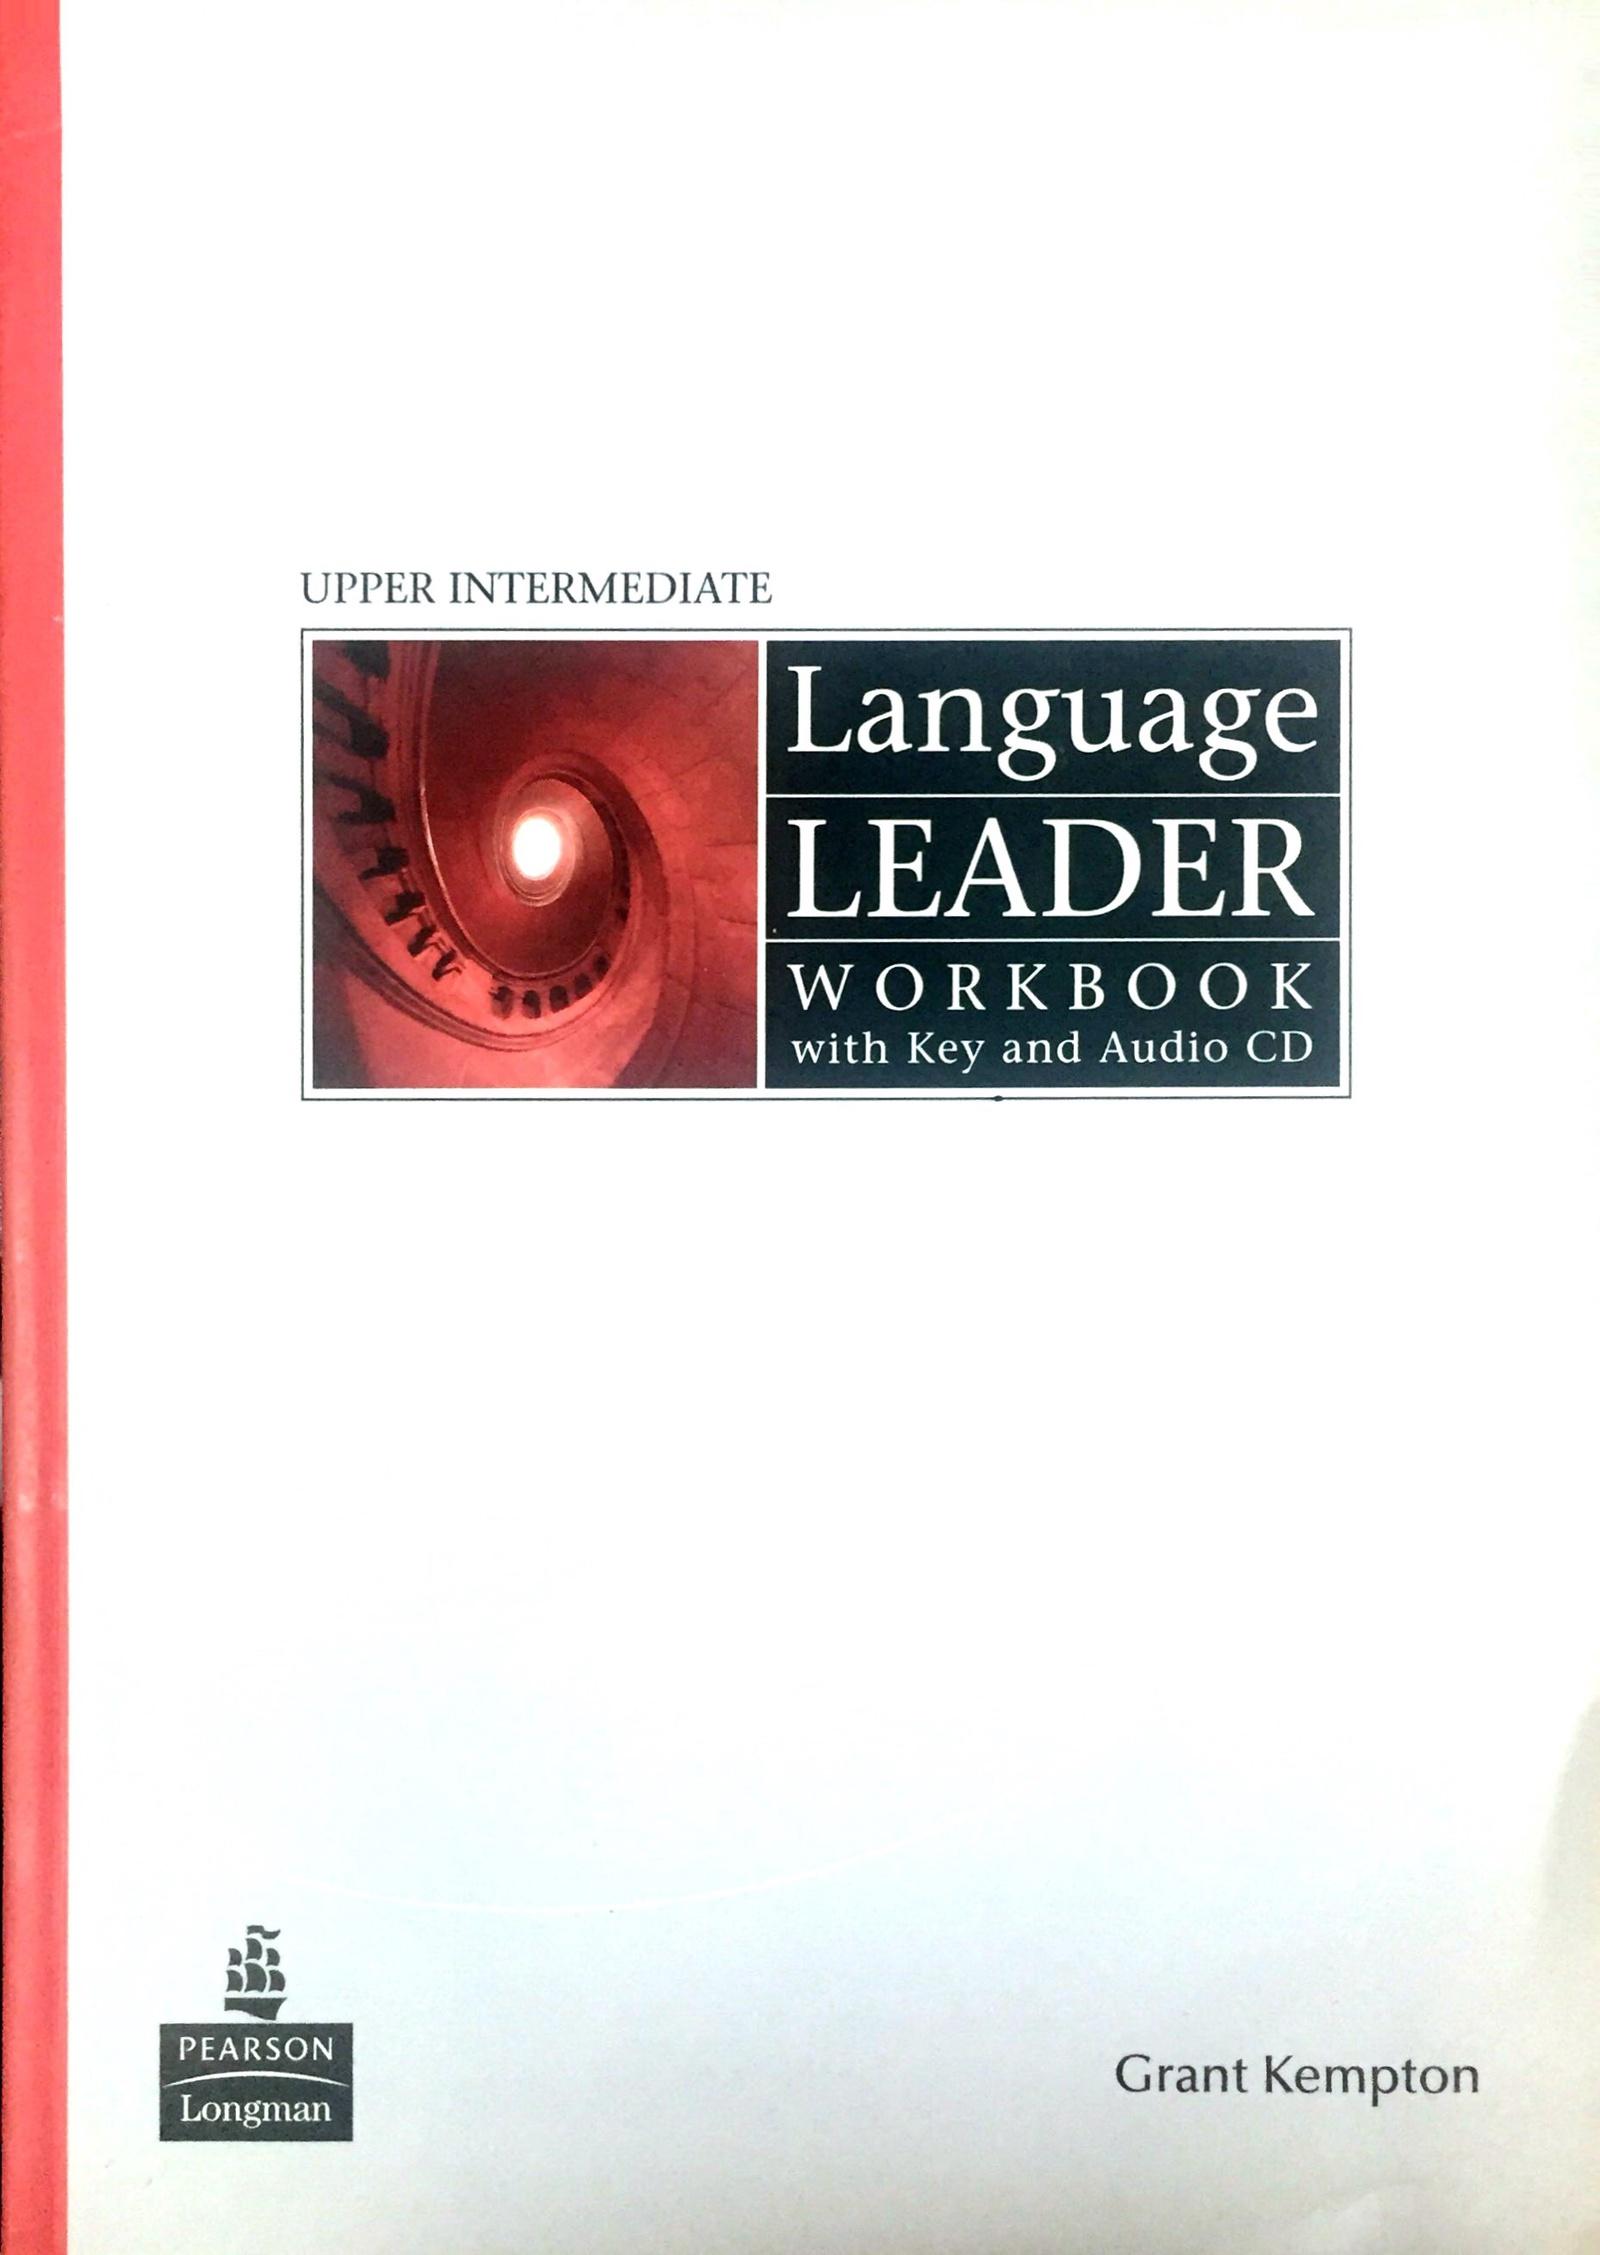 Grant Kemptonn Language Leader Workbook with Key and Audio CD. Upper Intermediate grammar practice for intermediate students with key cd